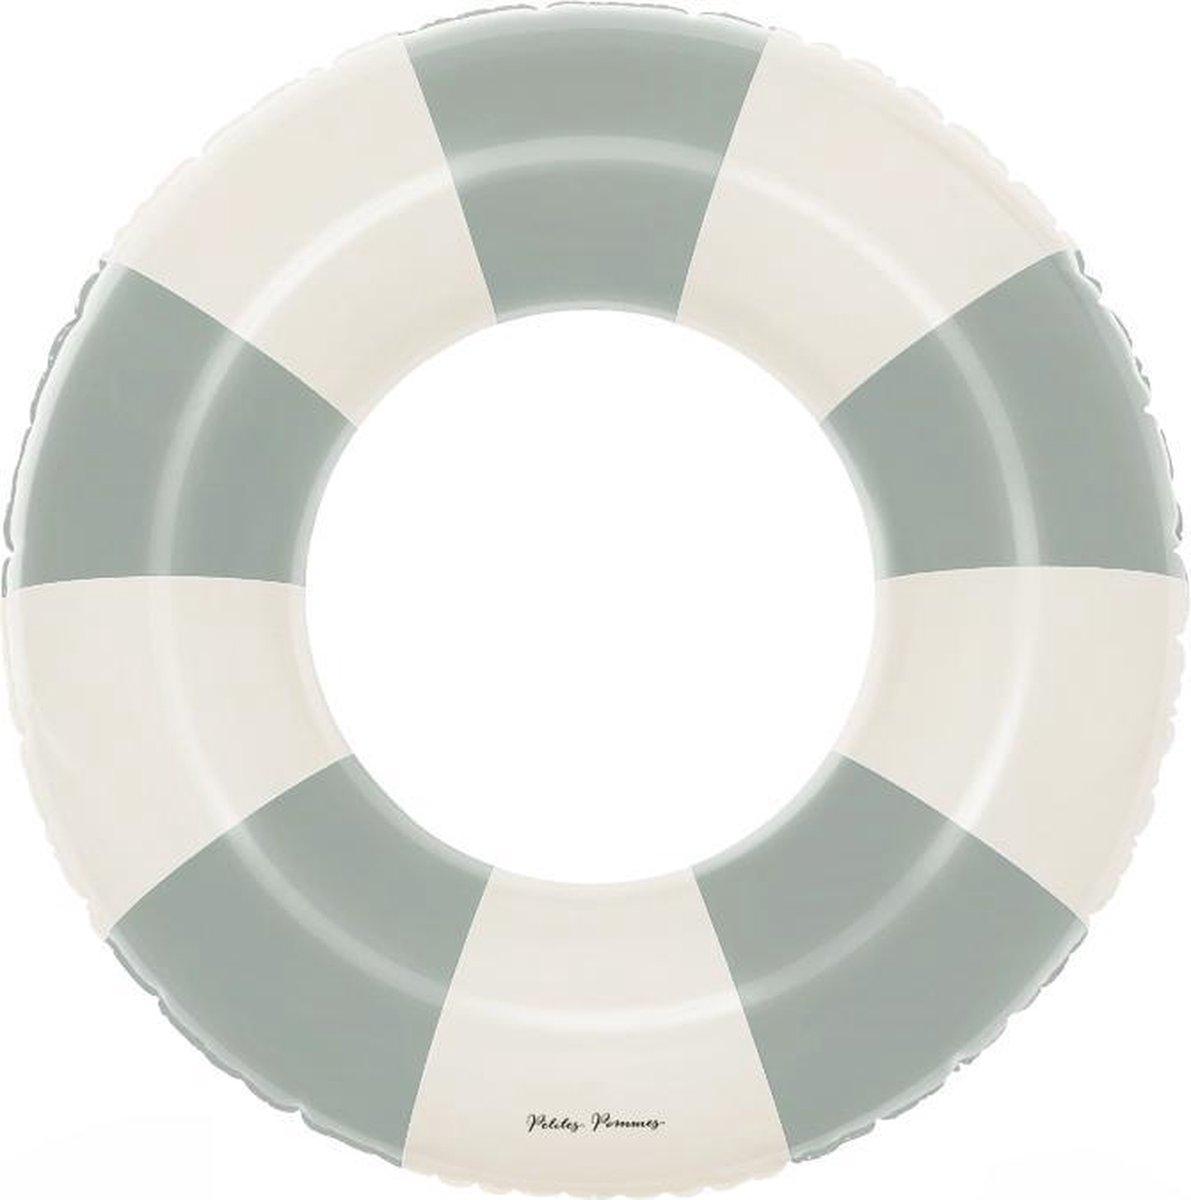 Petites Pommes Zwemring Calile - Zwemband - 45 cm - 1 tot 3 jaar